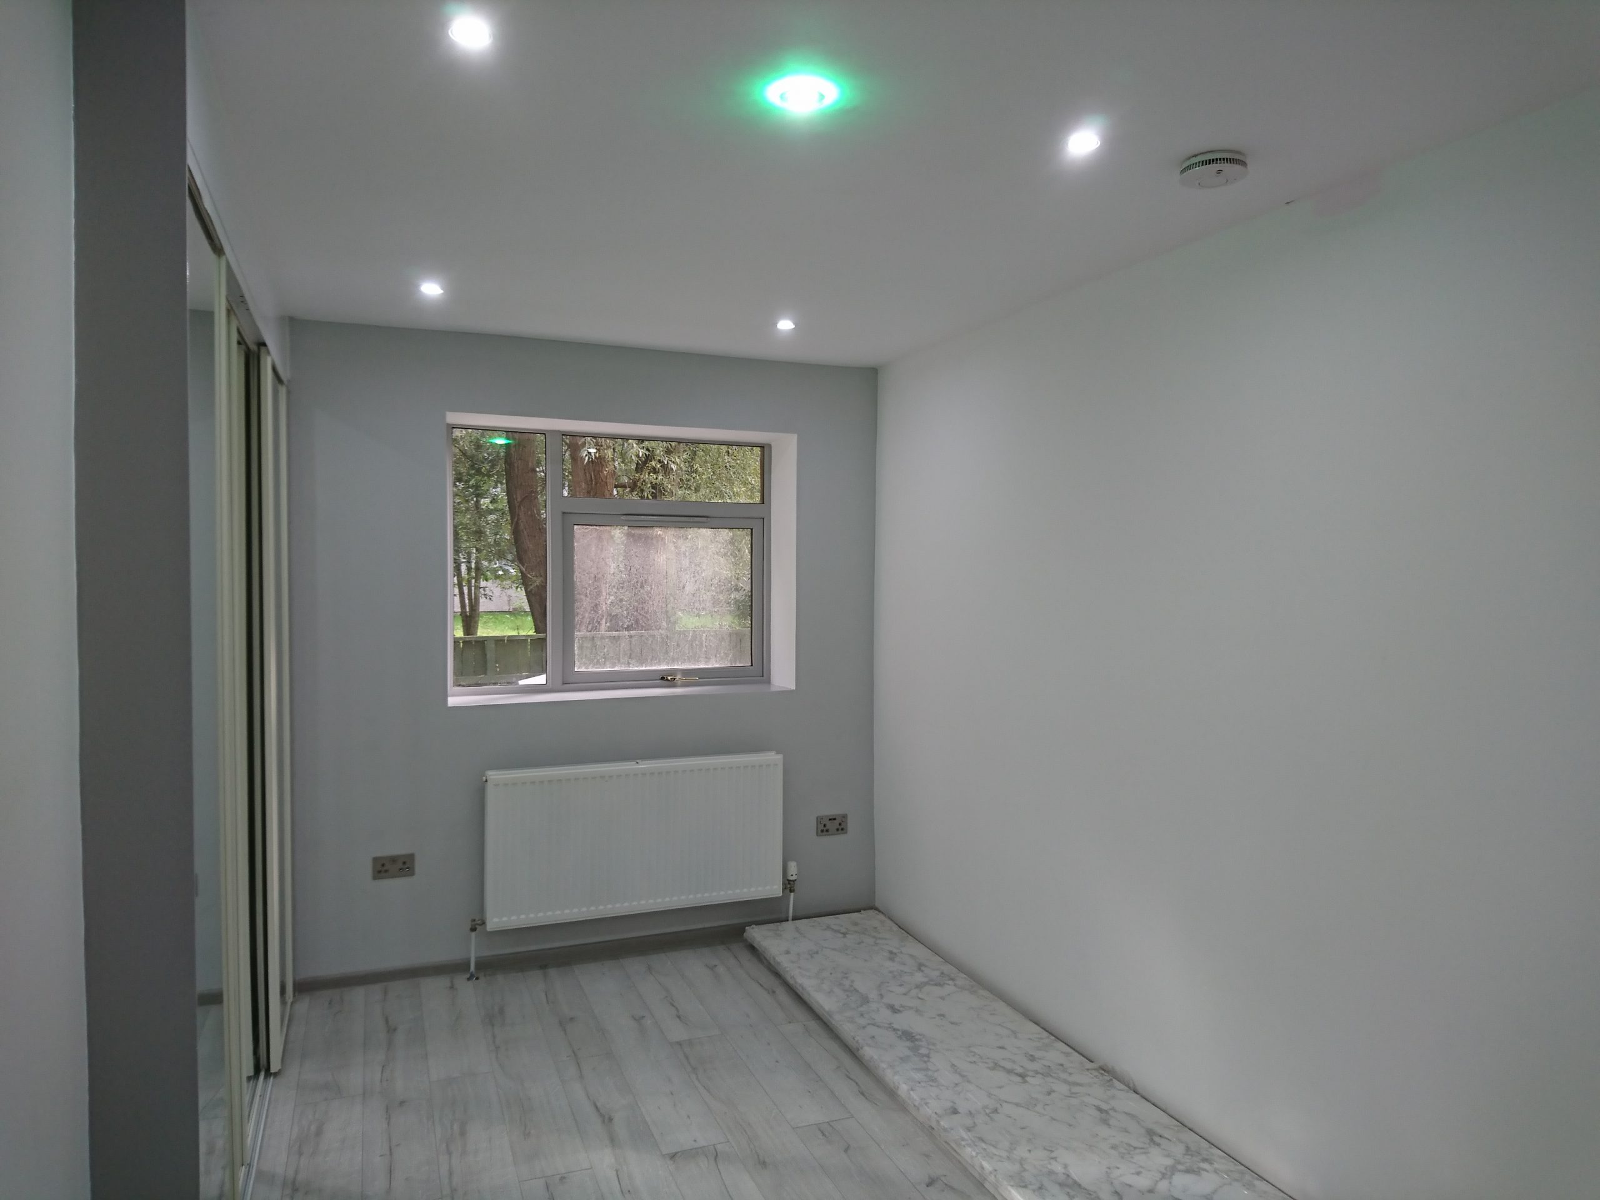 solid-wall-insulation-Edinburgh-insulation-contractors-Edinburgh